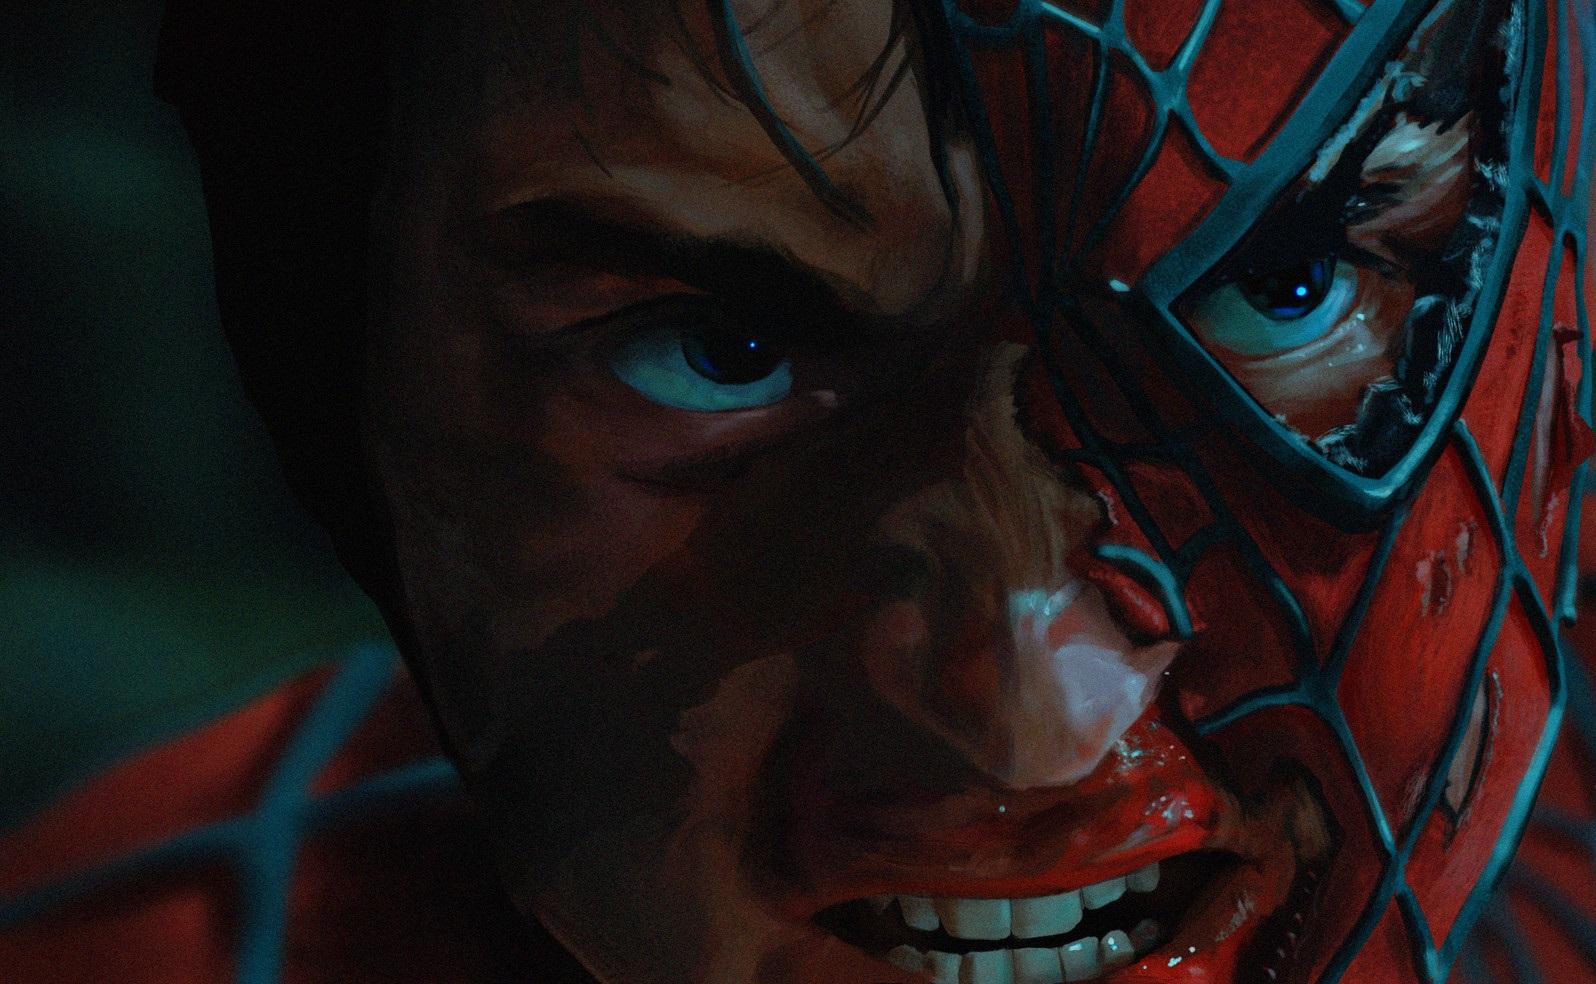 Wallpaper Digital Art Tobey Maguire Spider Man 1596x984